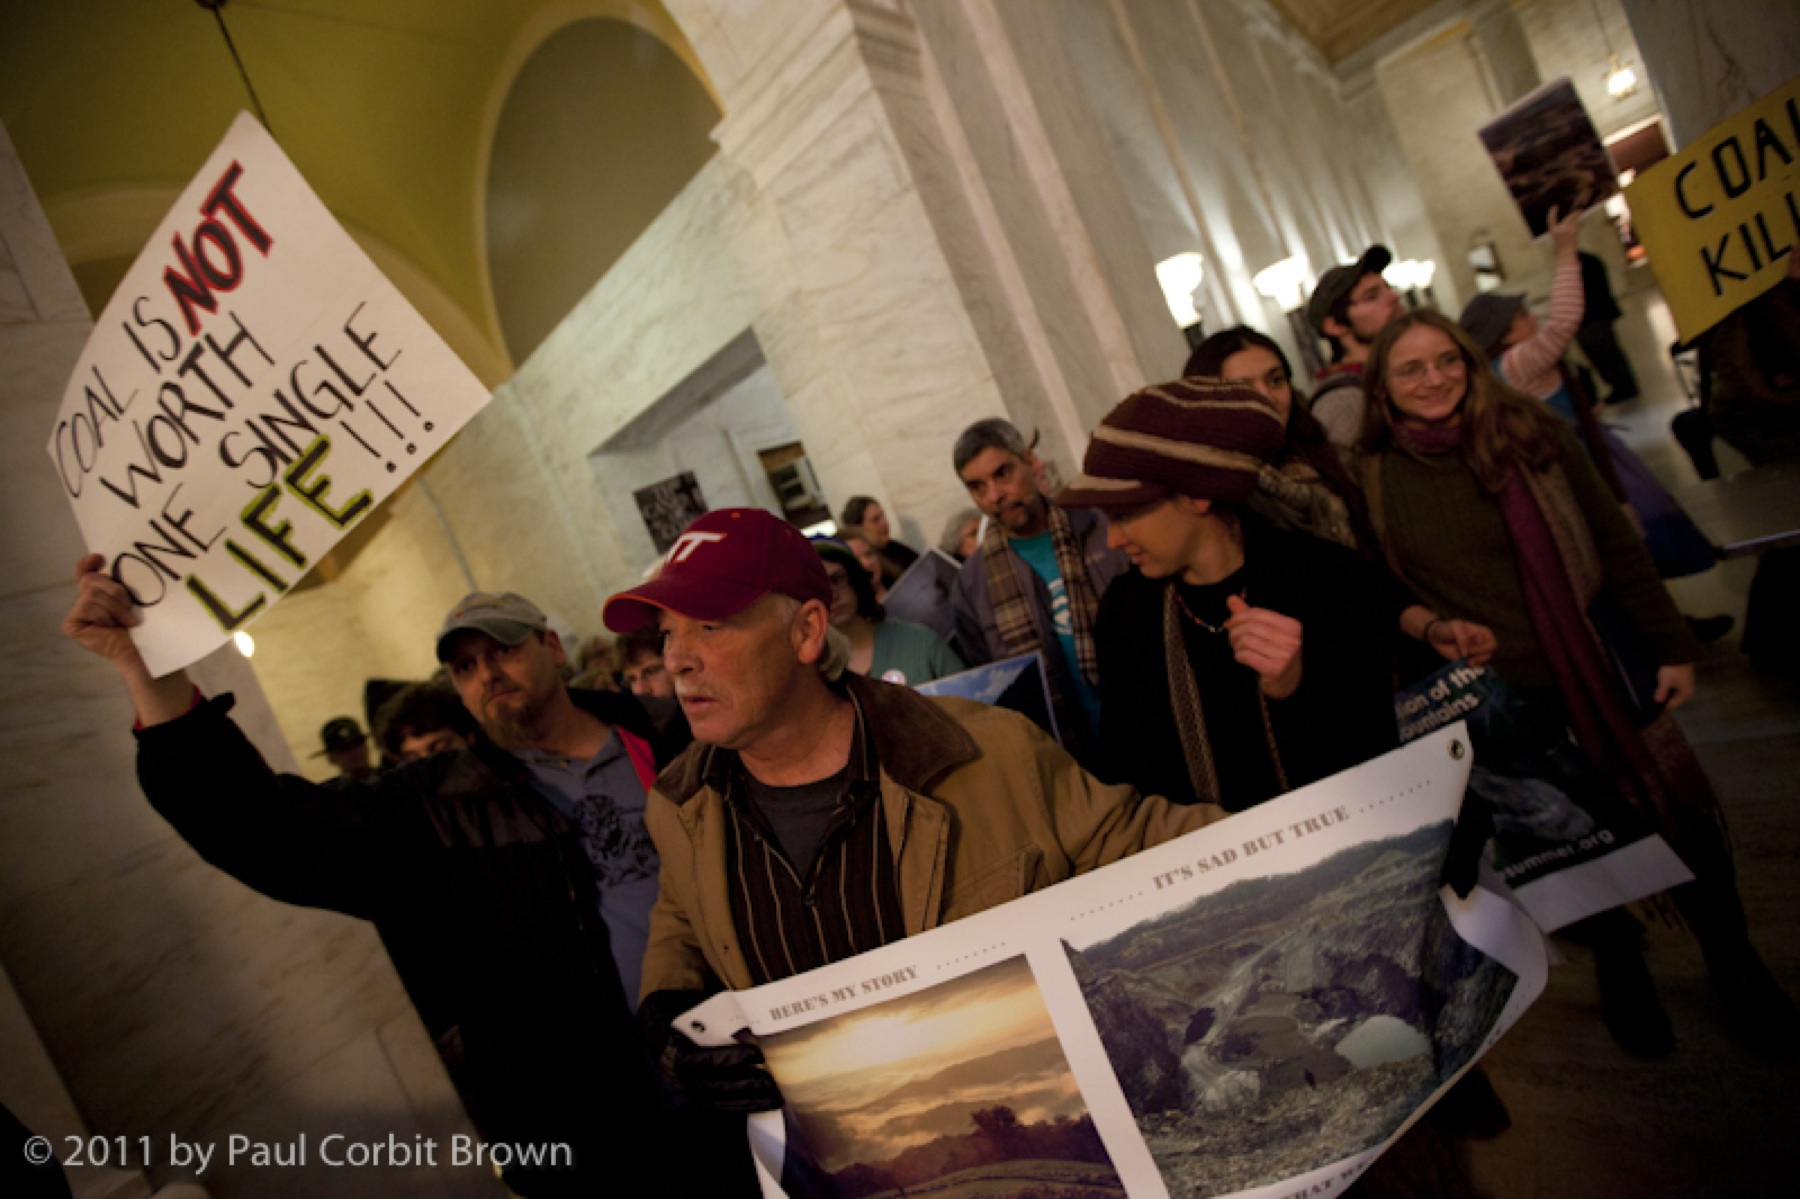 2011-01-20-coalrally3.jpg